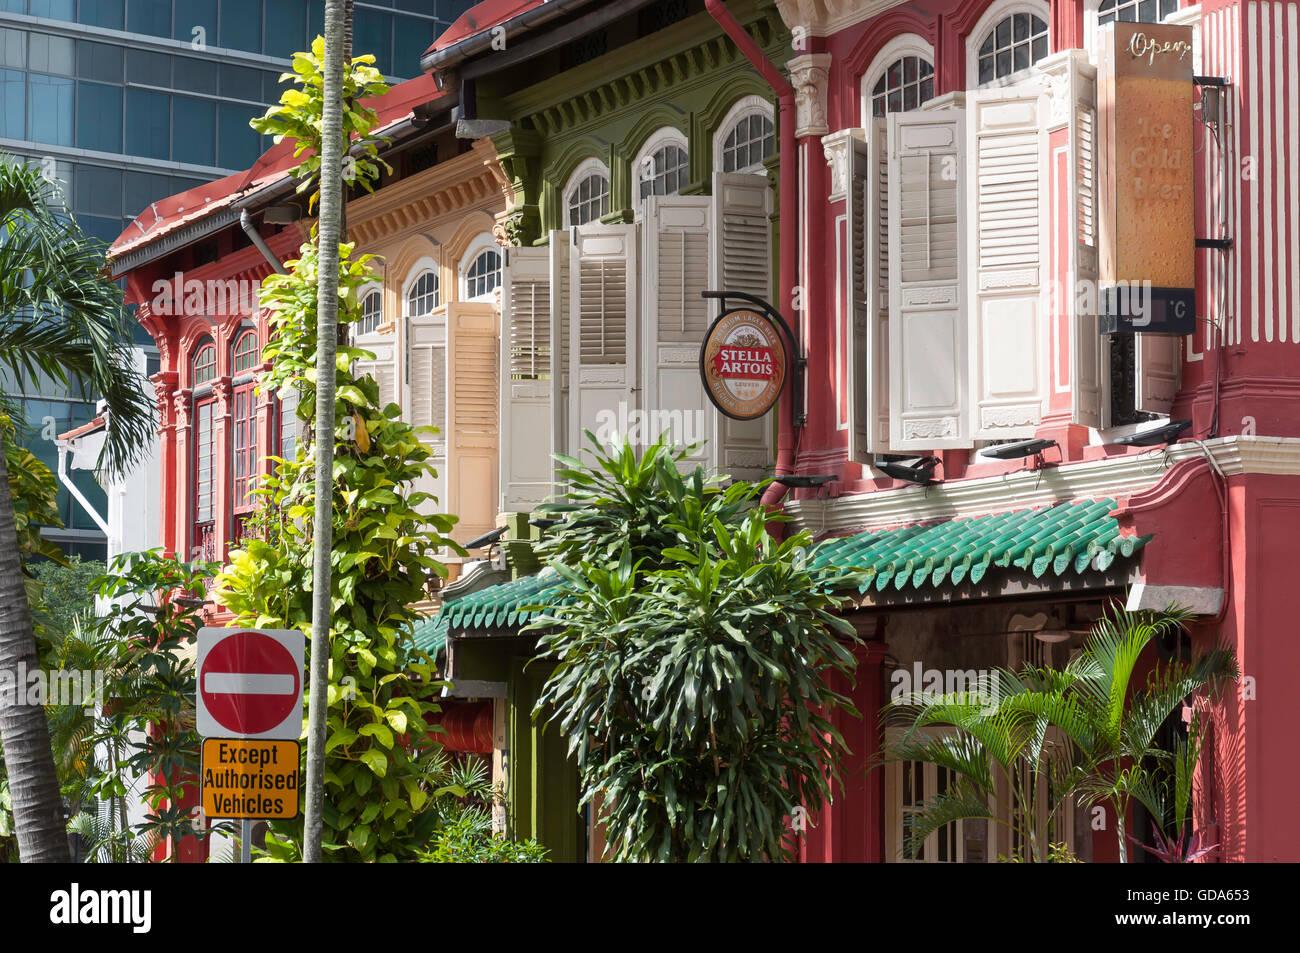 Arquitectura Colonial en Emerald Hill Road, zona central, isla de Singapur (Pulau Ujong), Singapur Imagen De Stock